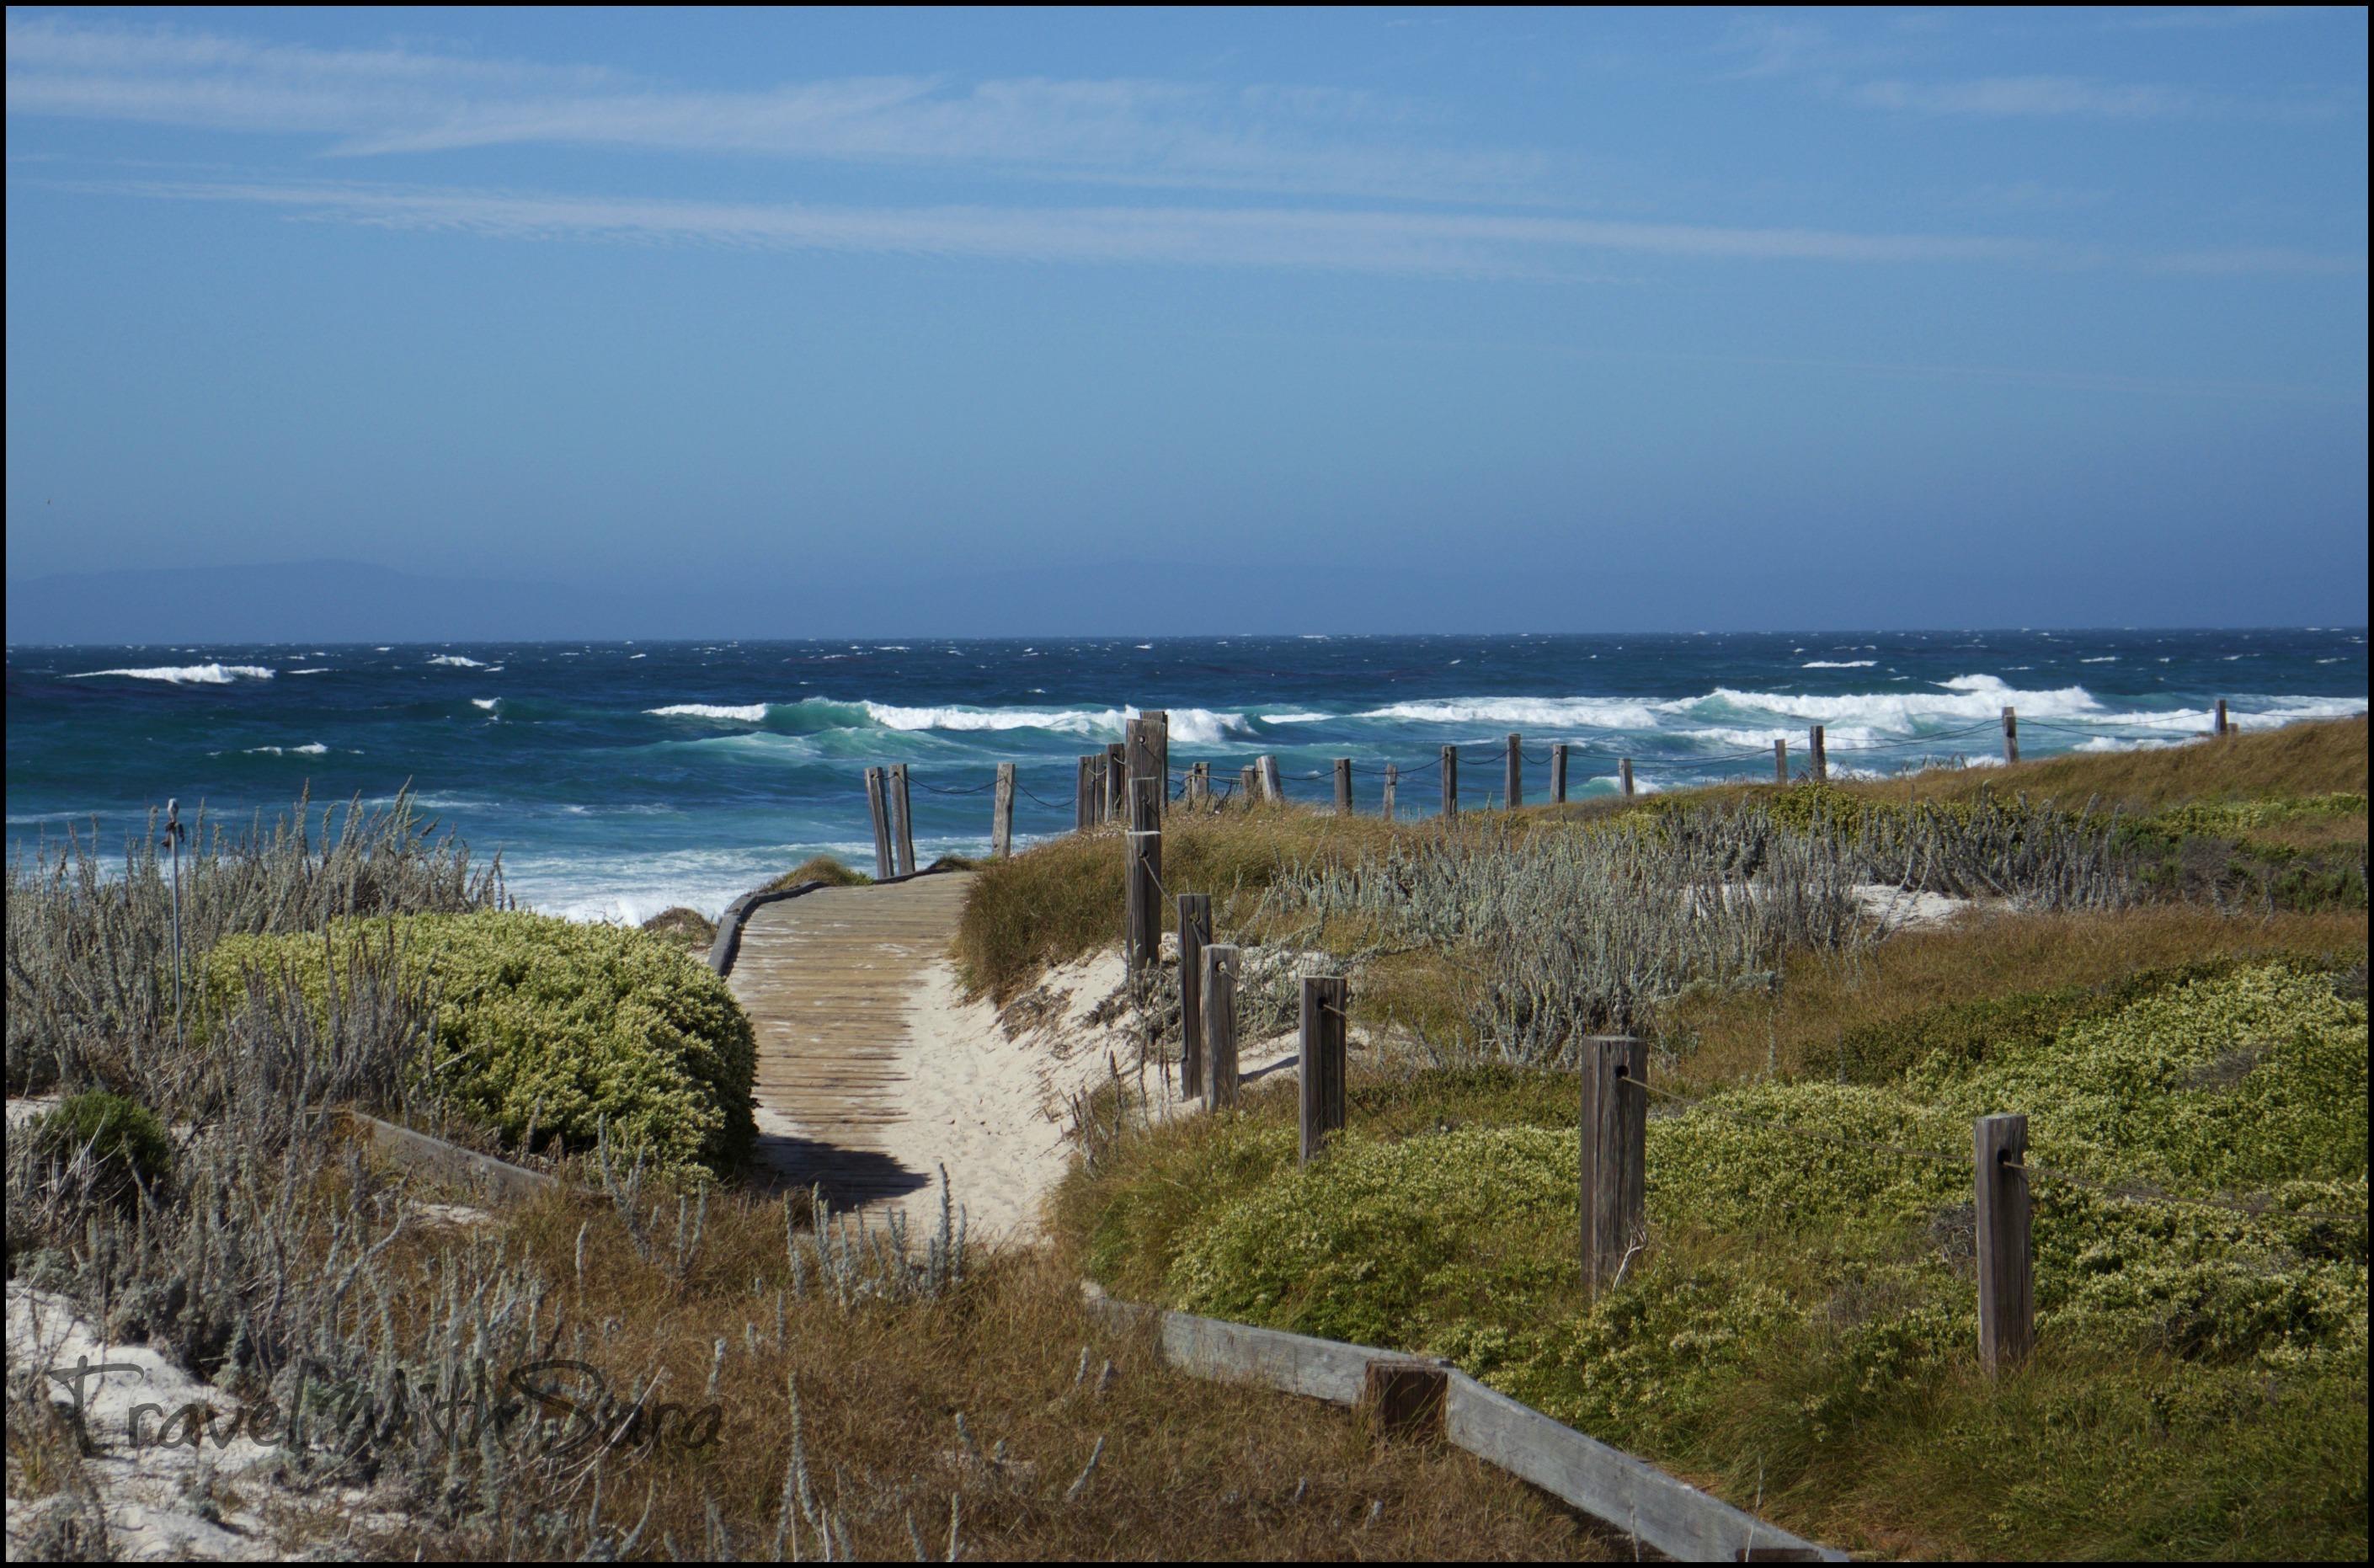 The coast in the area of Big Sur facing the Pacific Ocean ...  |Pacific Ocean California